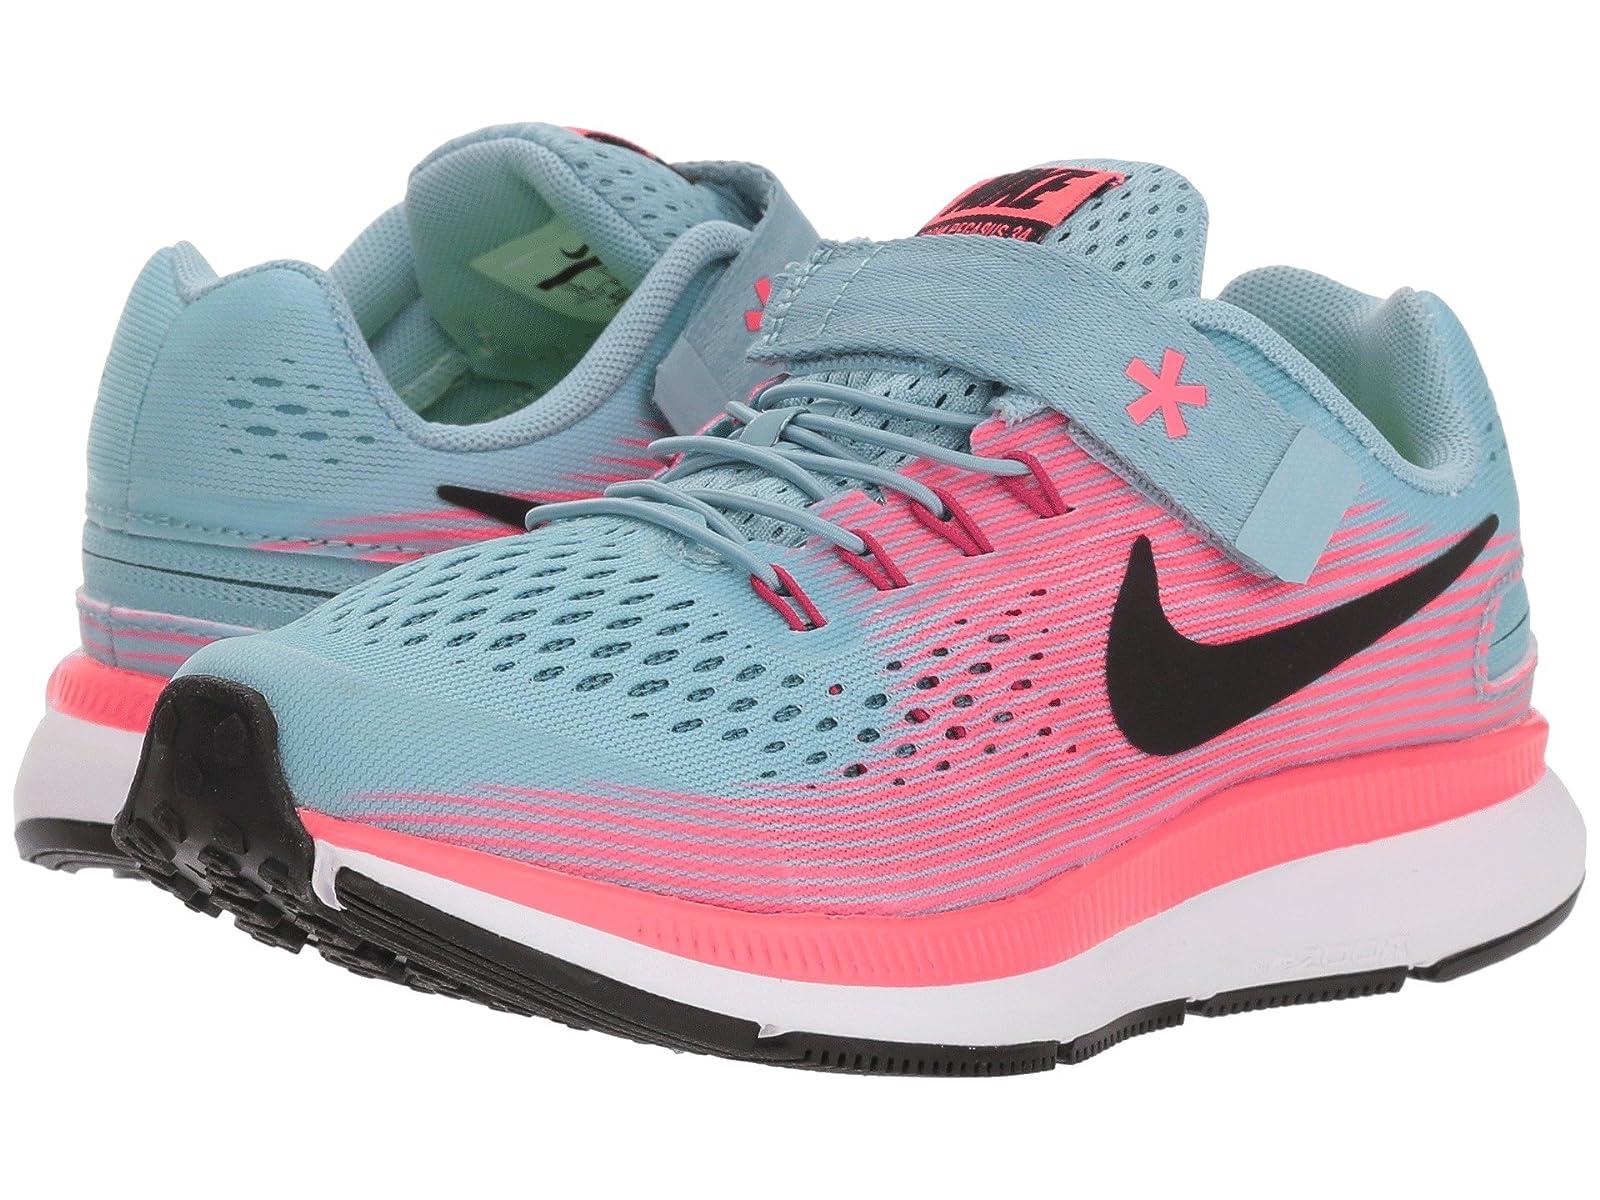 Nike Kids Zoom Pegasus 34 FlyEase WIDE (Little Kid/Big Kid)Atmospheric grades have affordable shoes